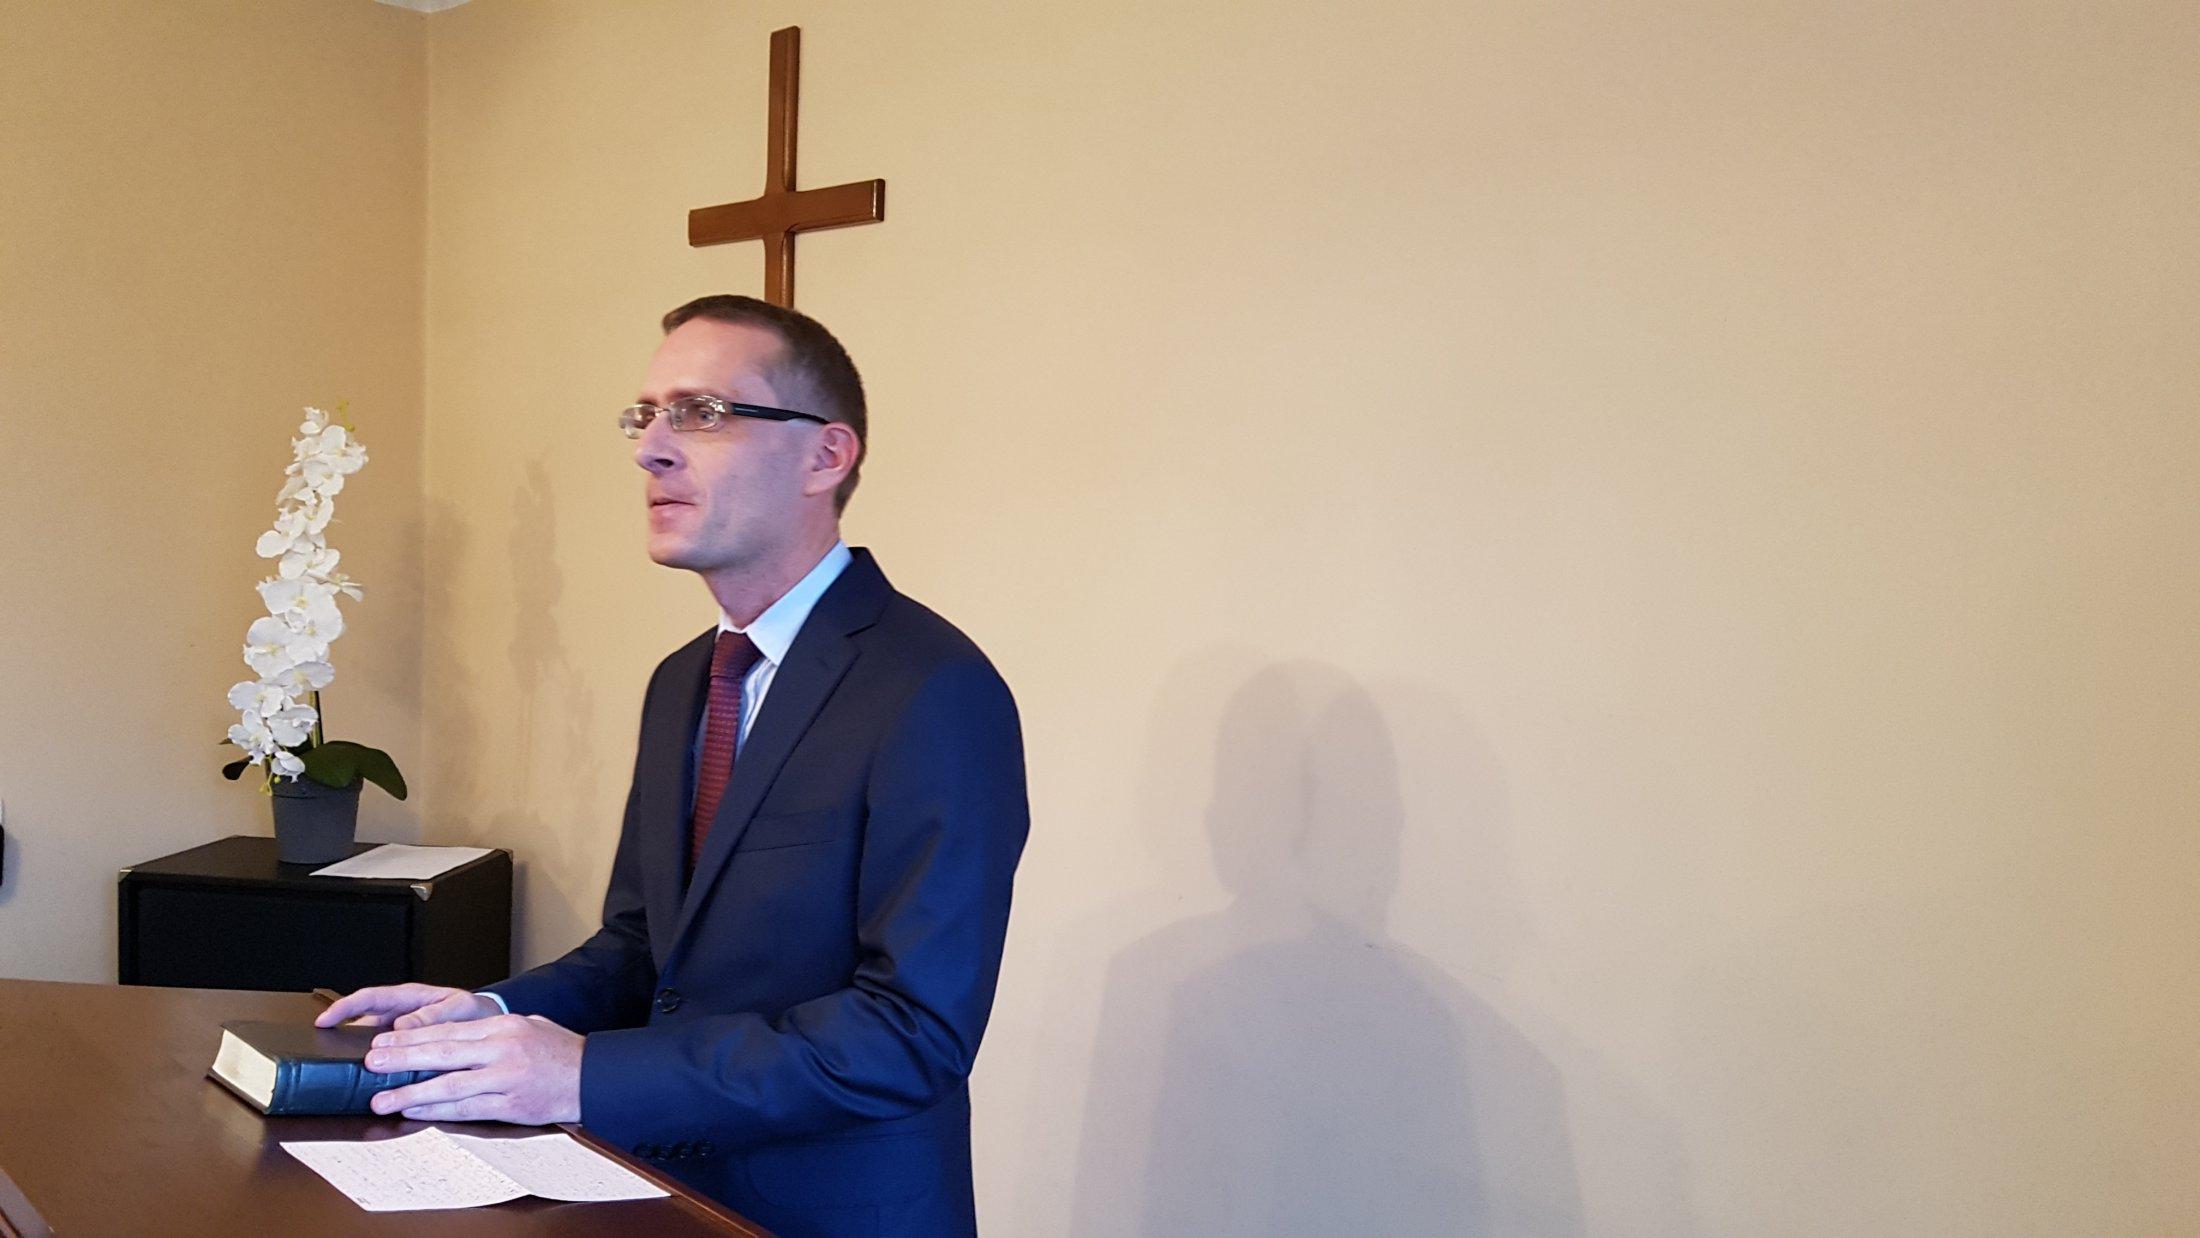 Pastor Piotr Stachurski